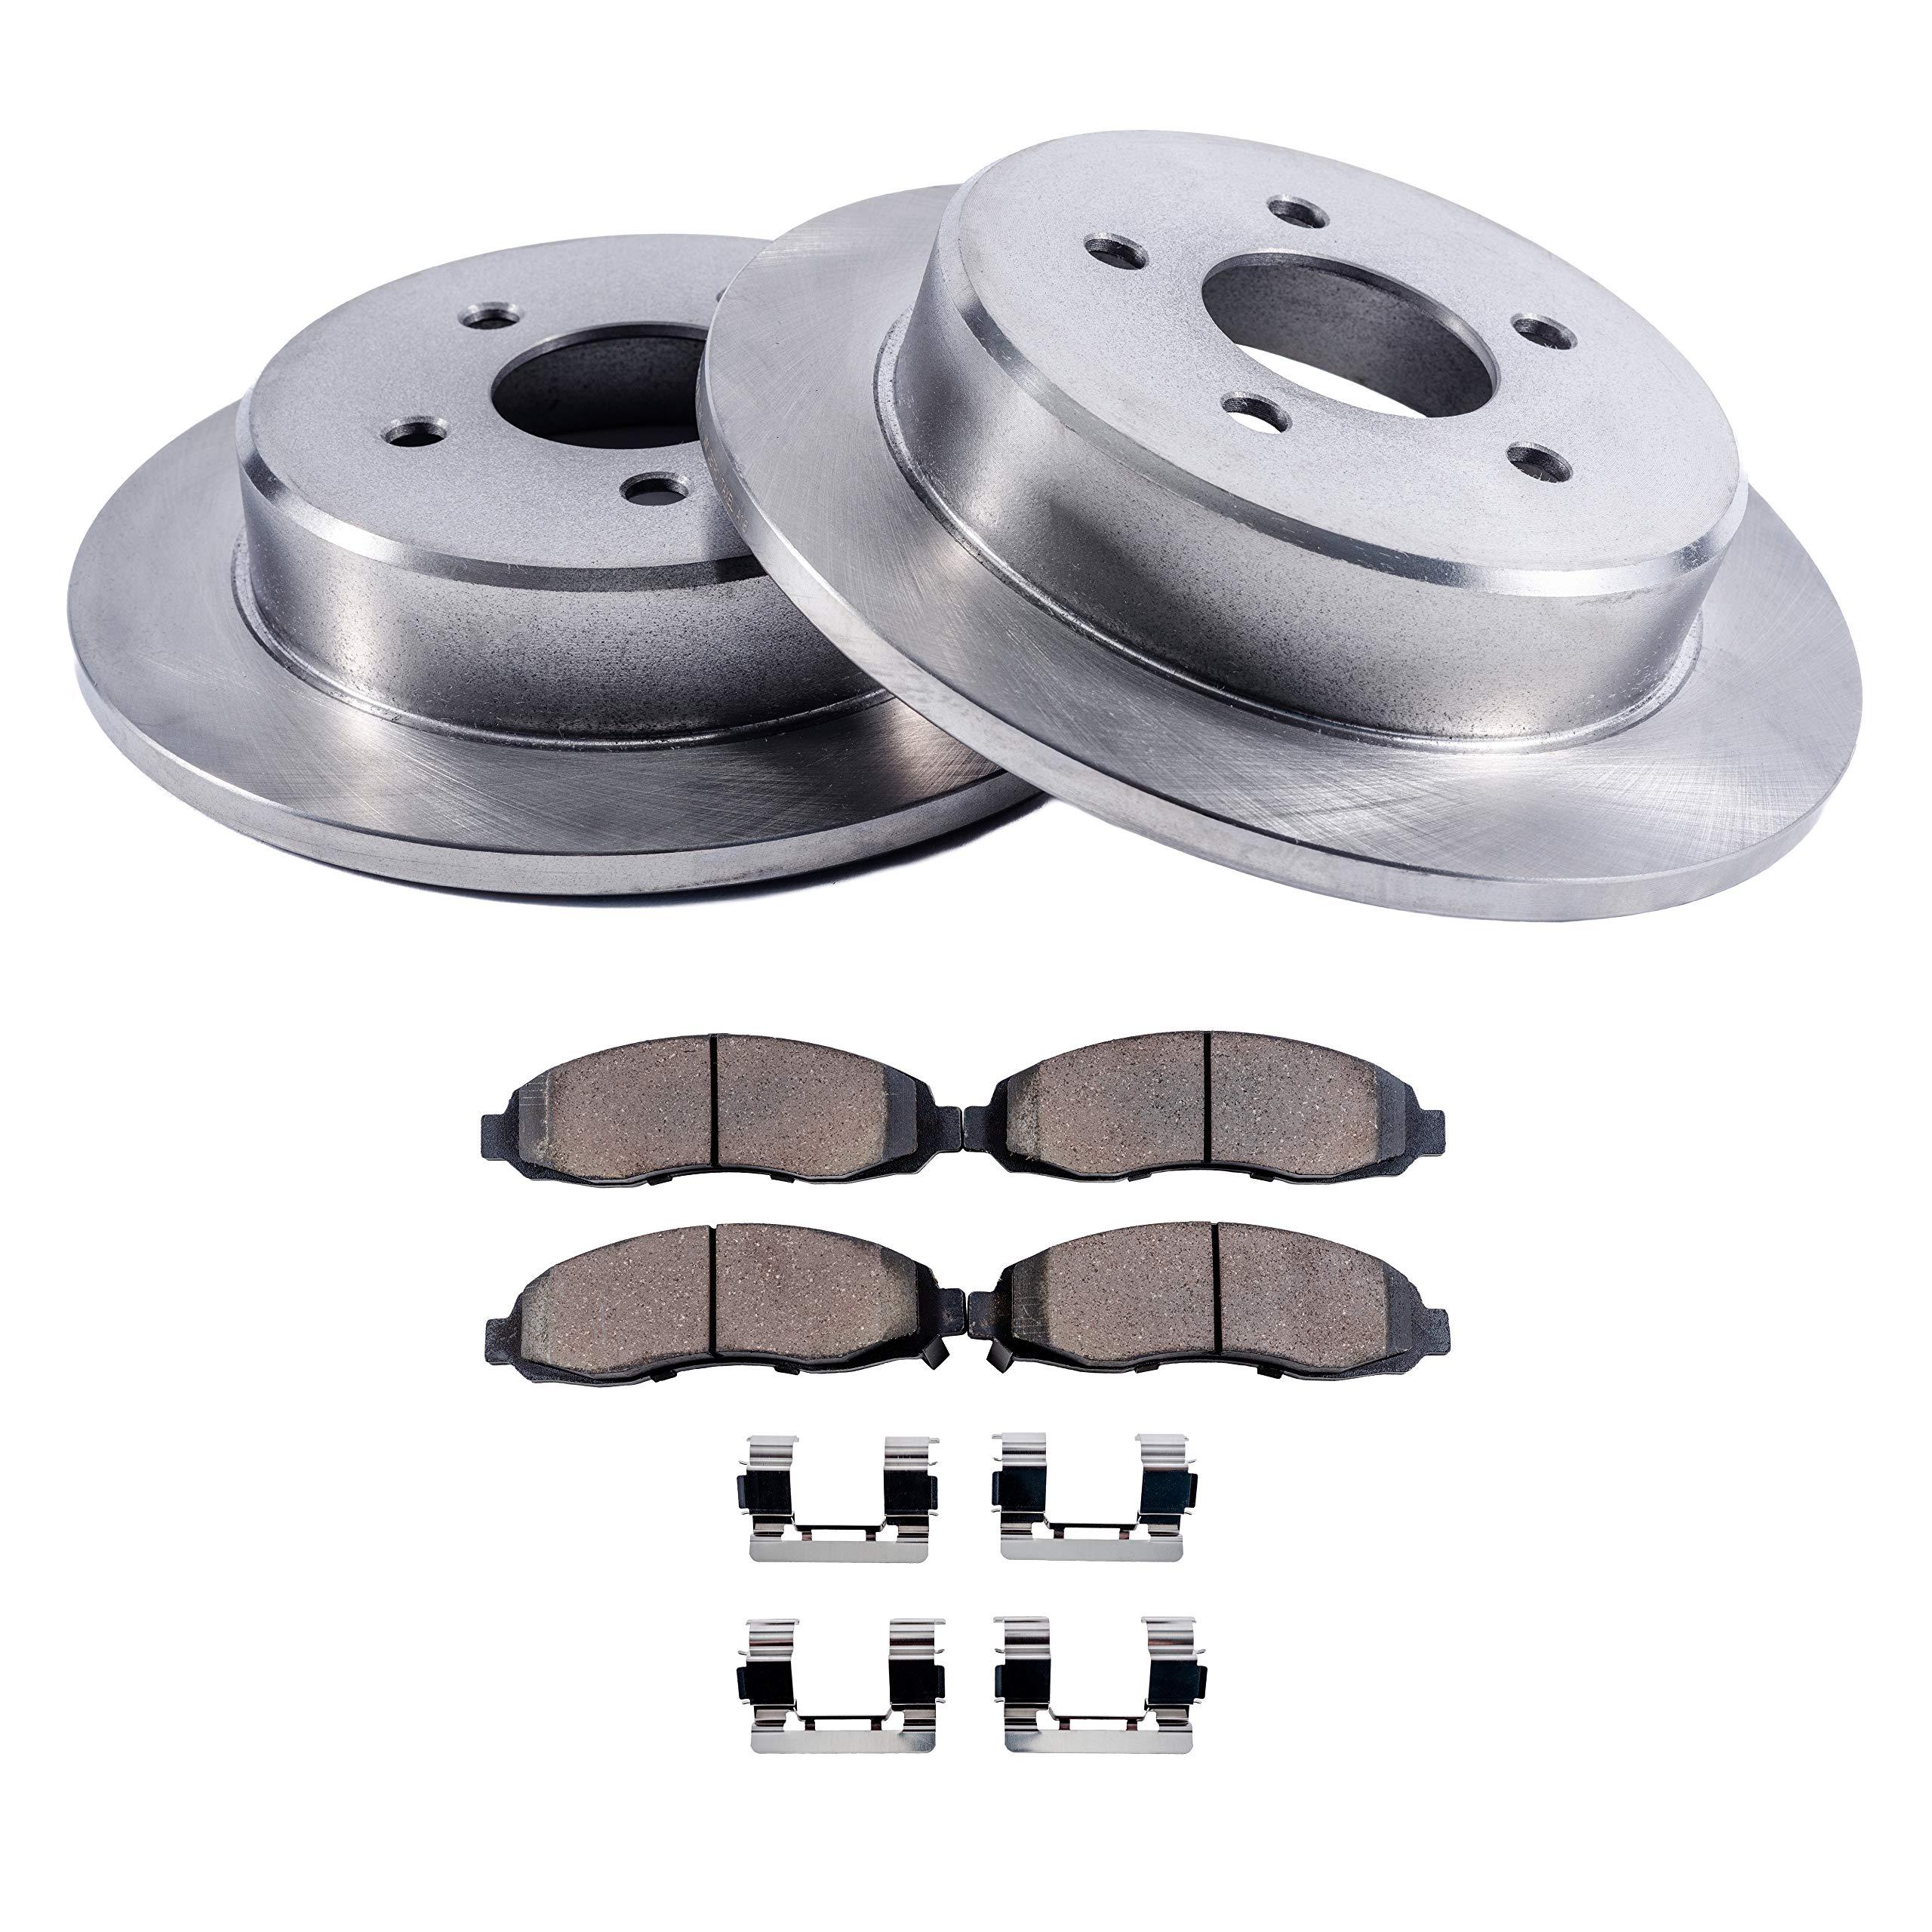 Detroit Axle - 5-Lug Rear Disc Brake Rotors & Ceramic Pads w/Clips Hardware Kit - Premium GRADE